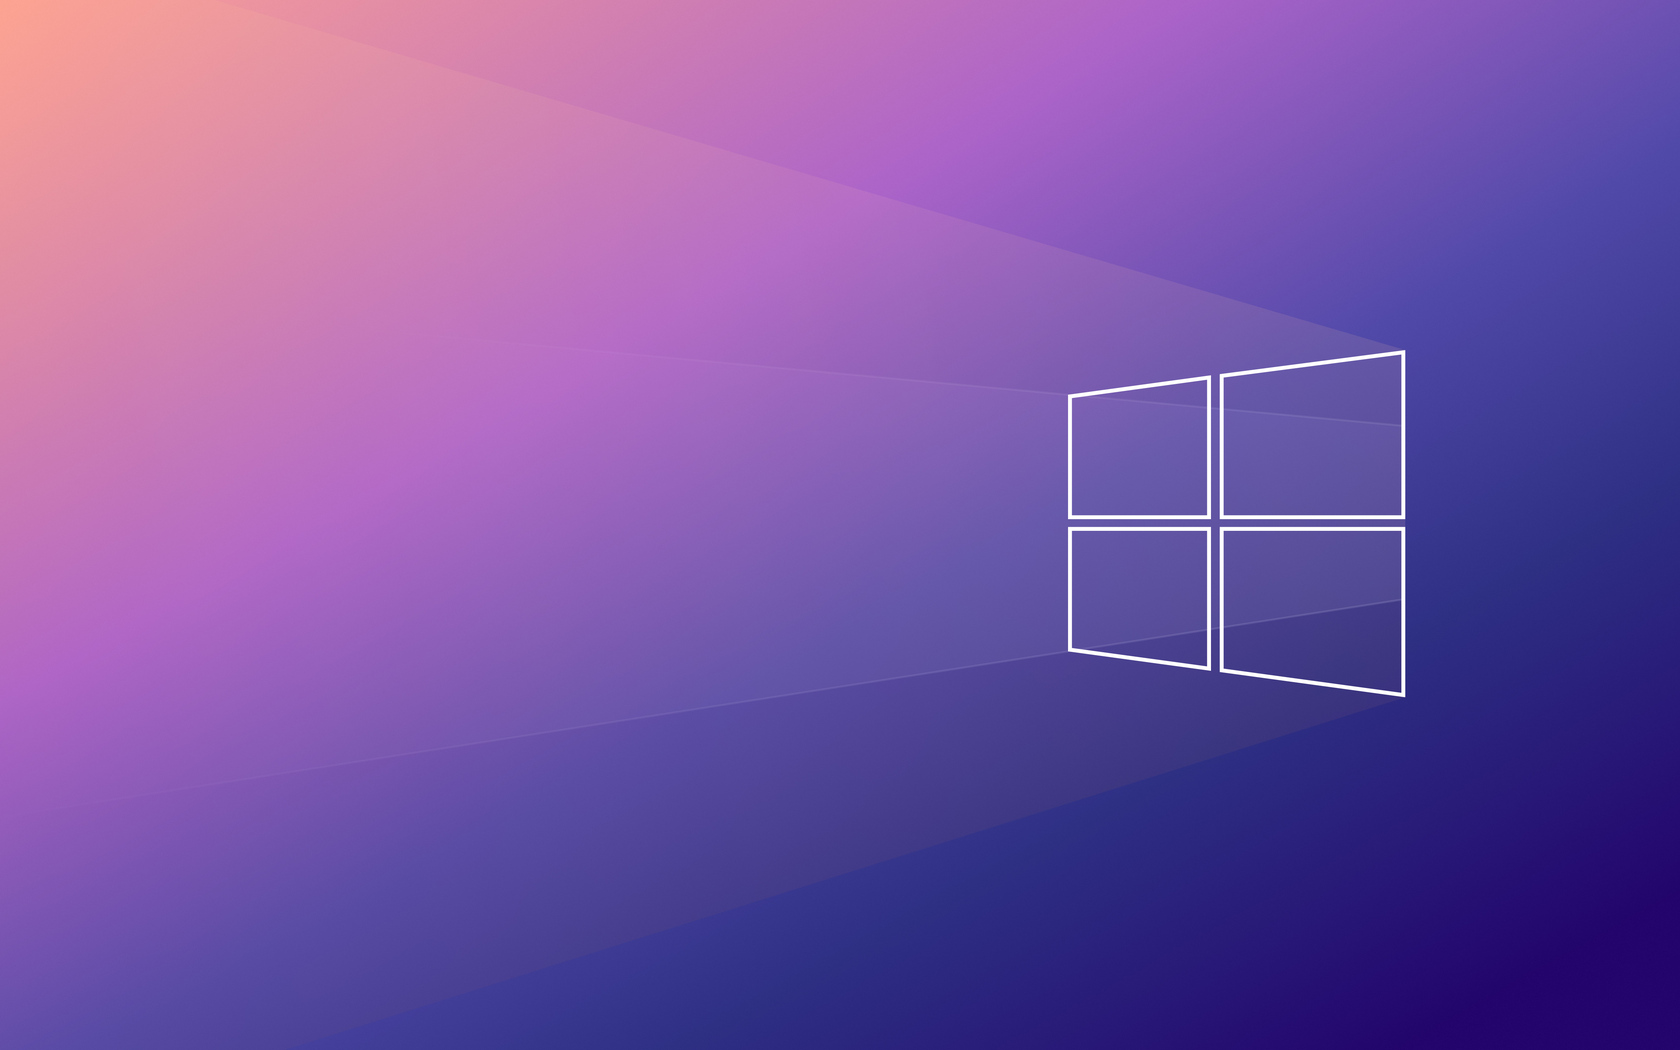 windows-minimal-back-to-basics-5k-kf.jpg